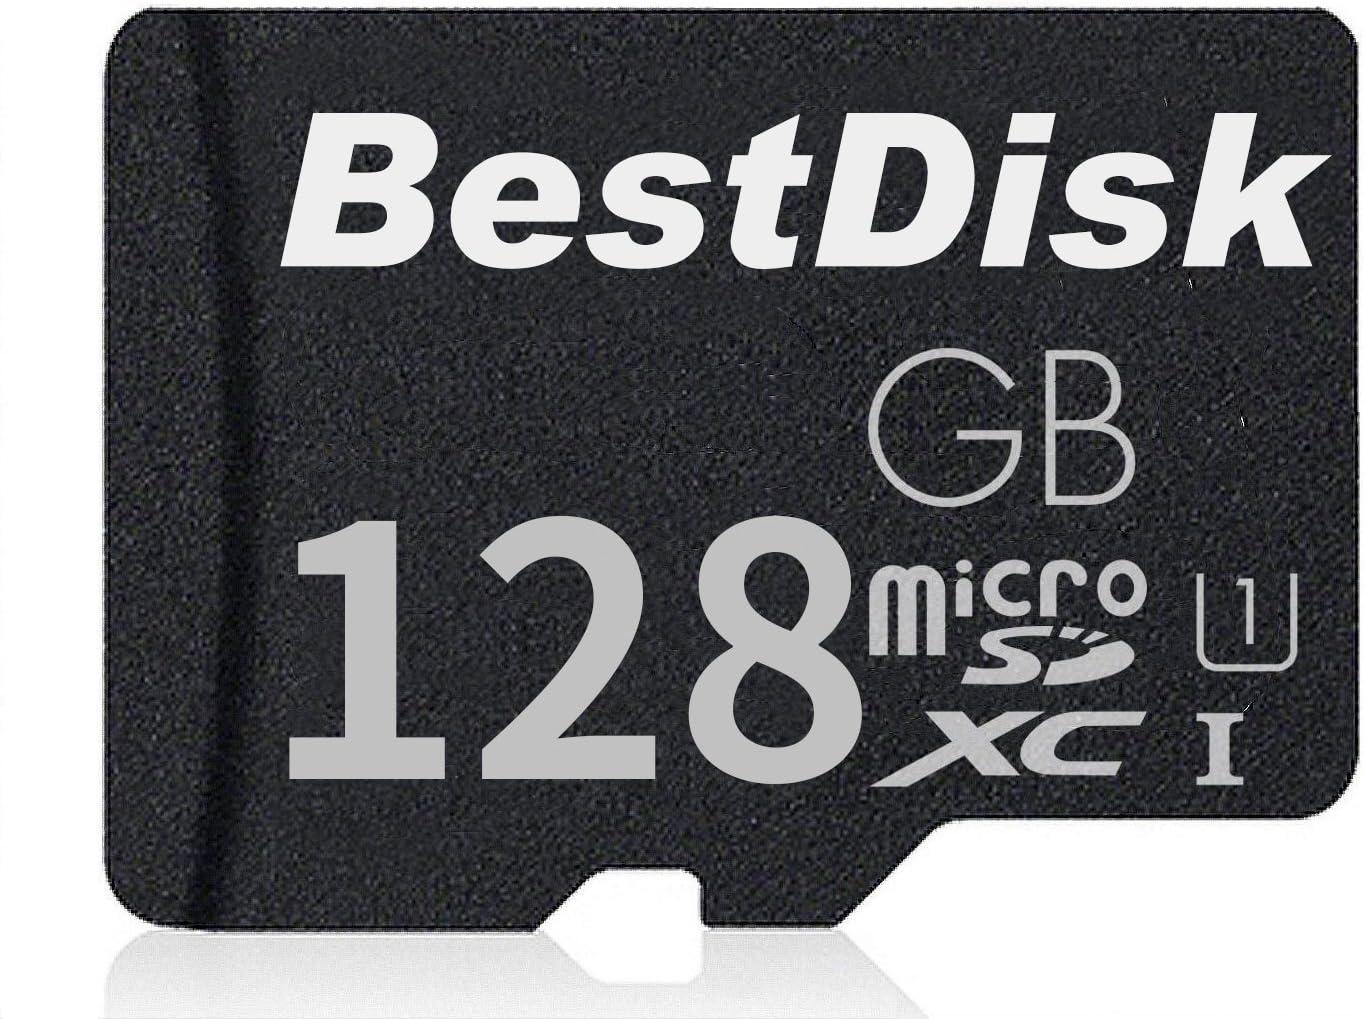 Bestdisk Micro Sd 128gb Class 10 Sdxc Memory Card Computers Accessories